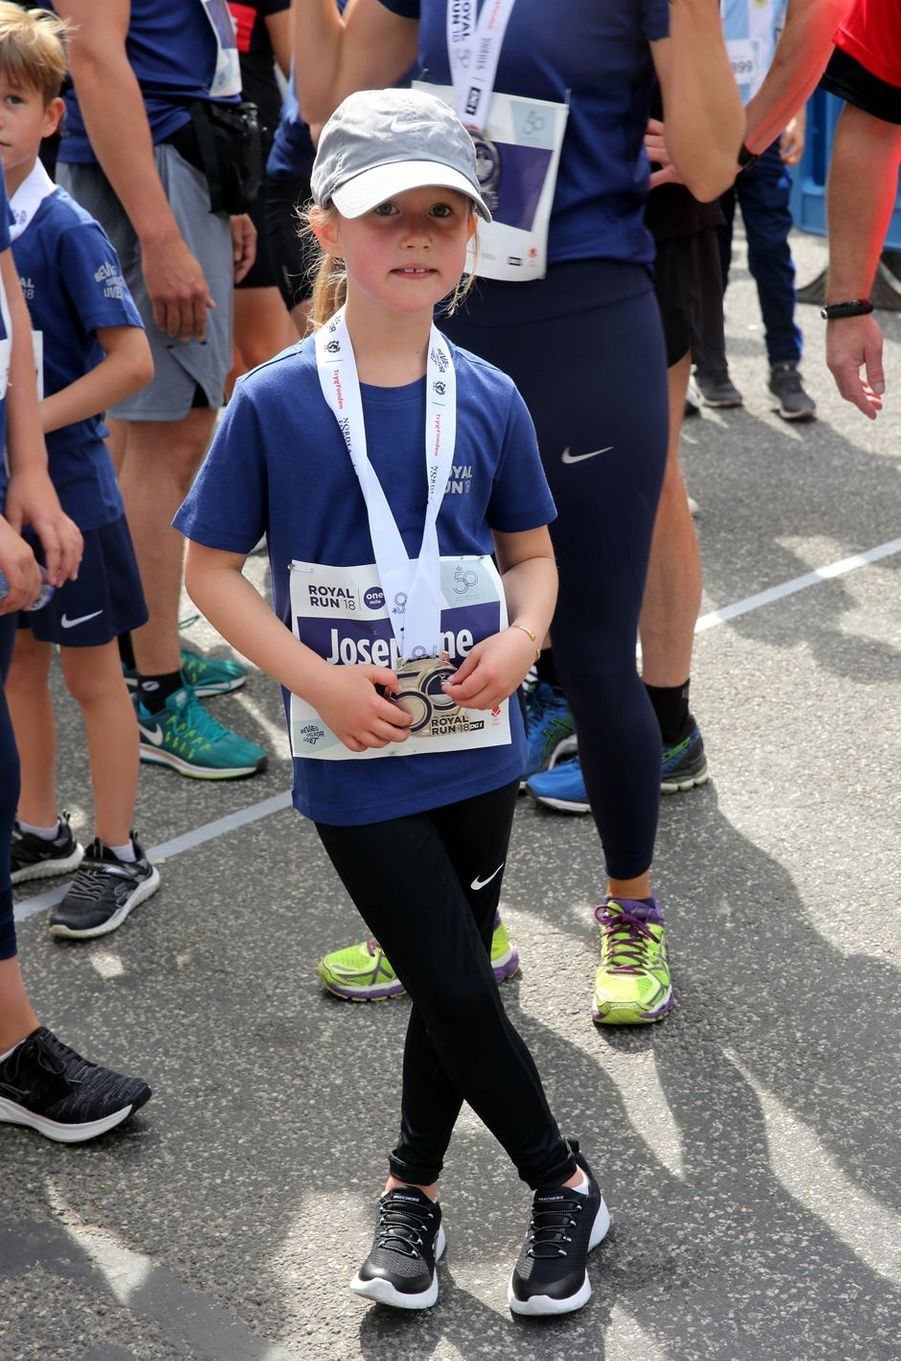 La princesse Josephine de Danemark à la Royal Run à Copenhague, le 21 mai 2018